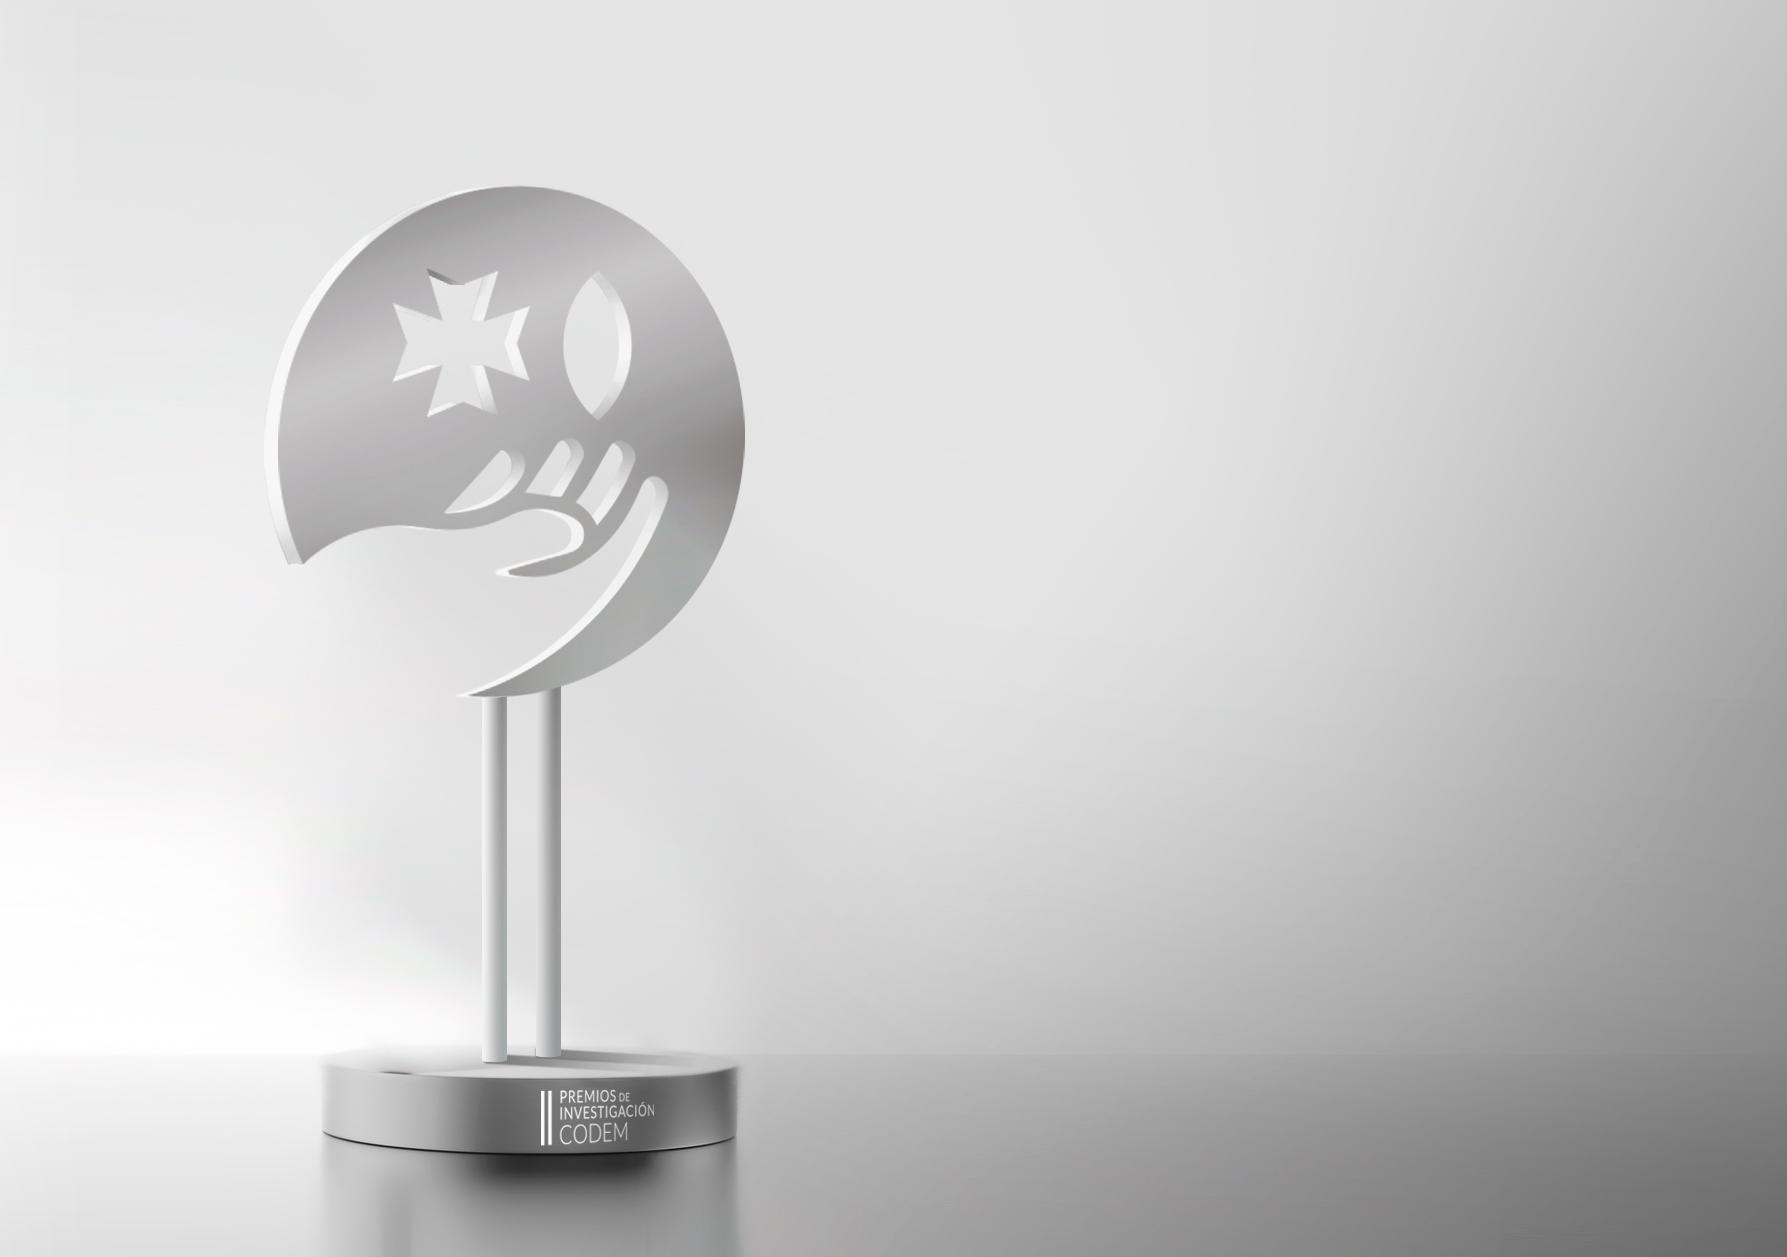 Galardón premios CODEM